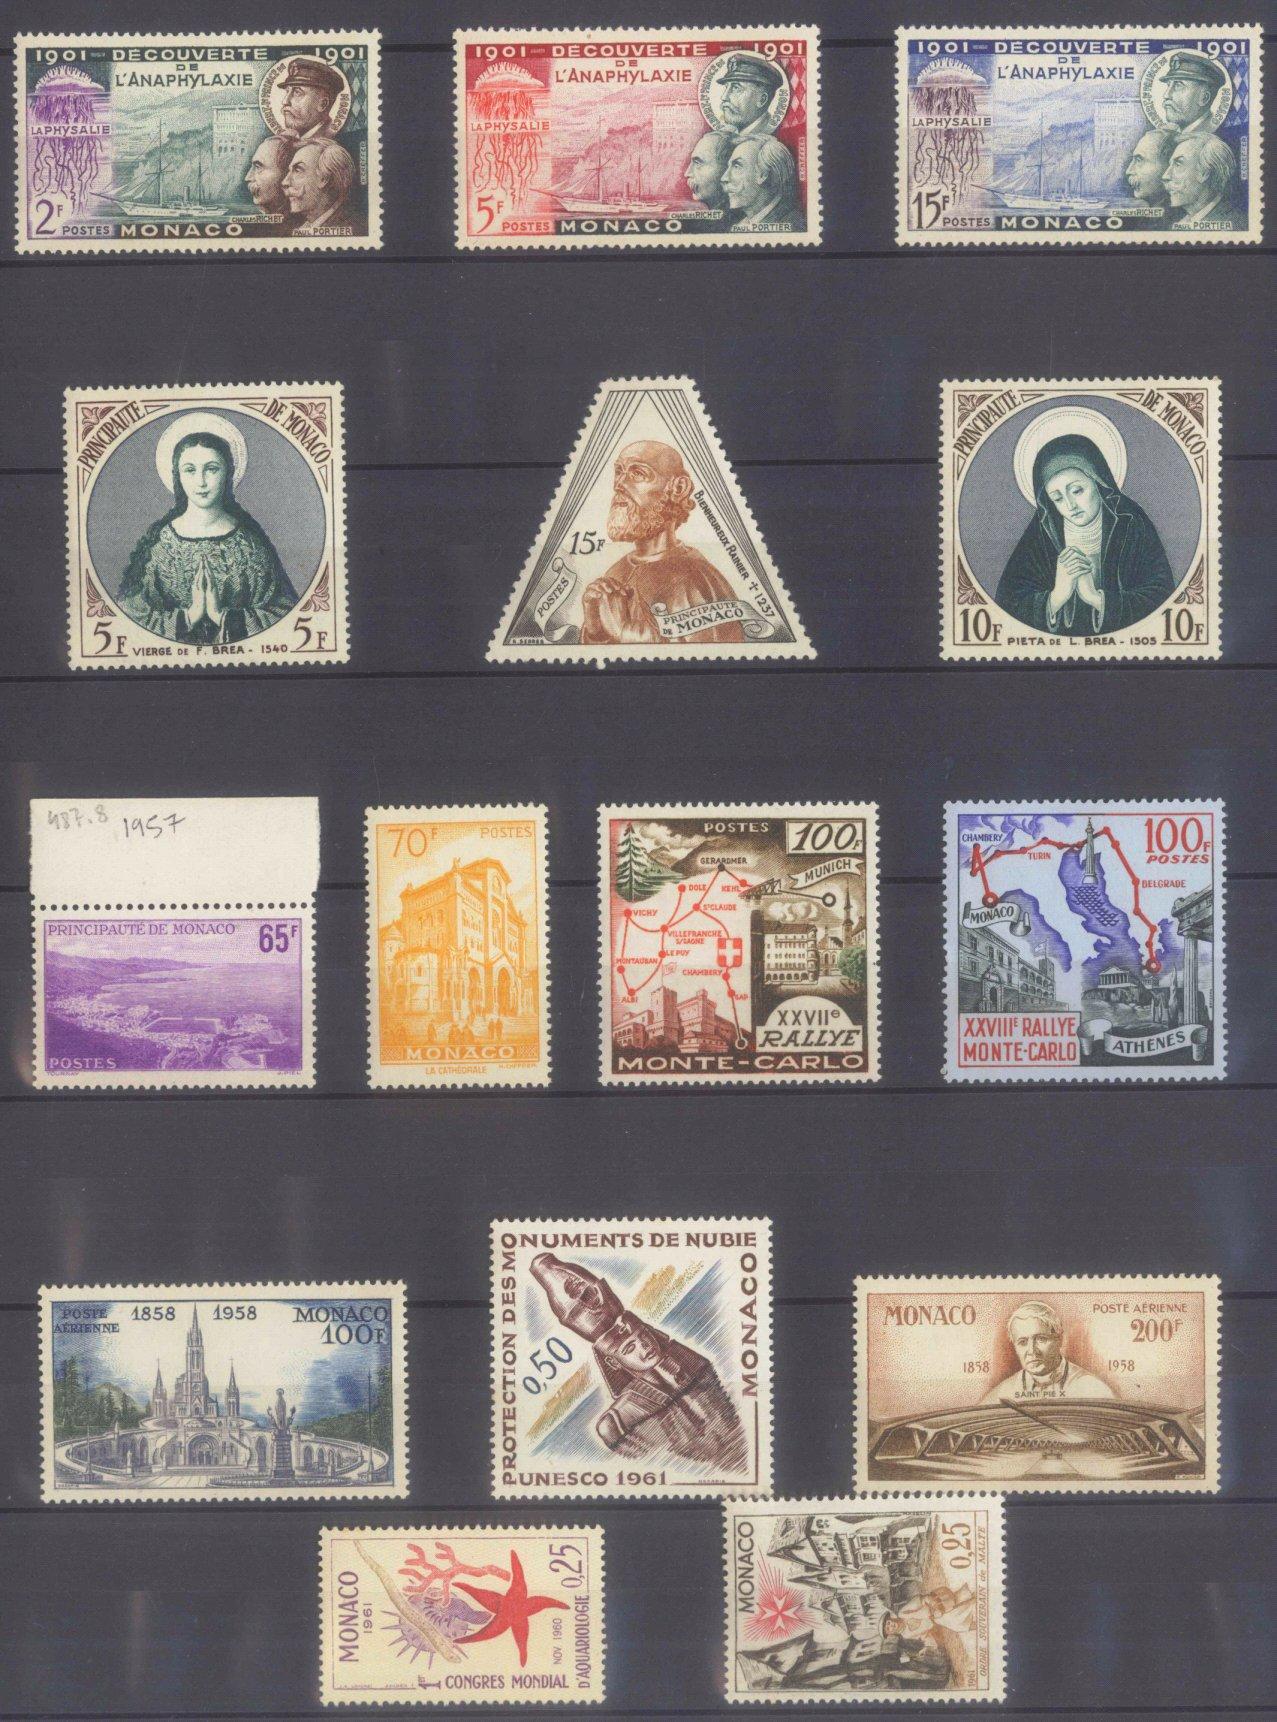 MONACO 1953-1989, Katalogwert 970,- Euro-6